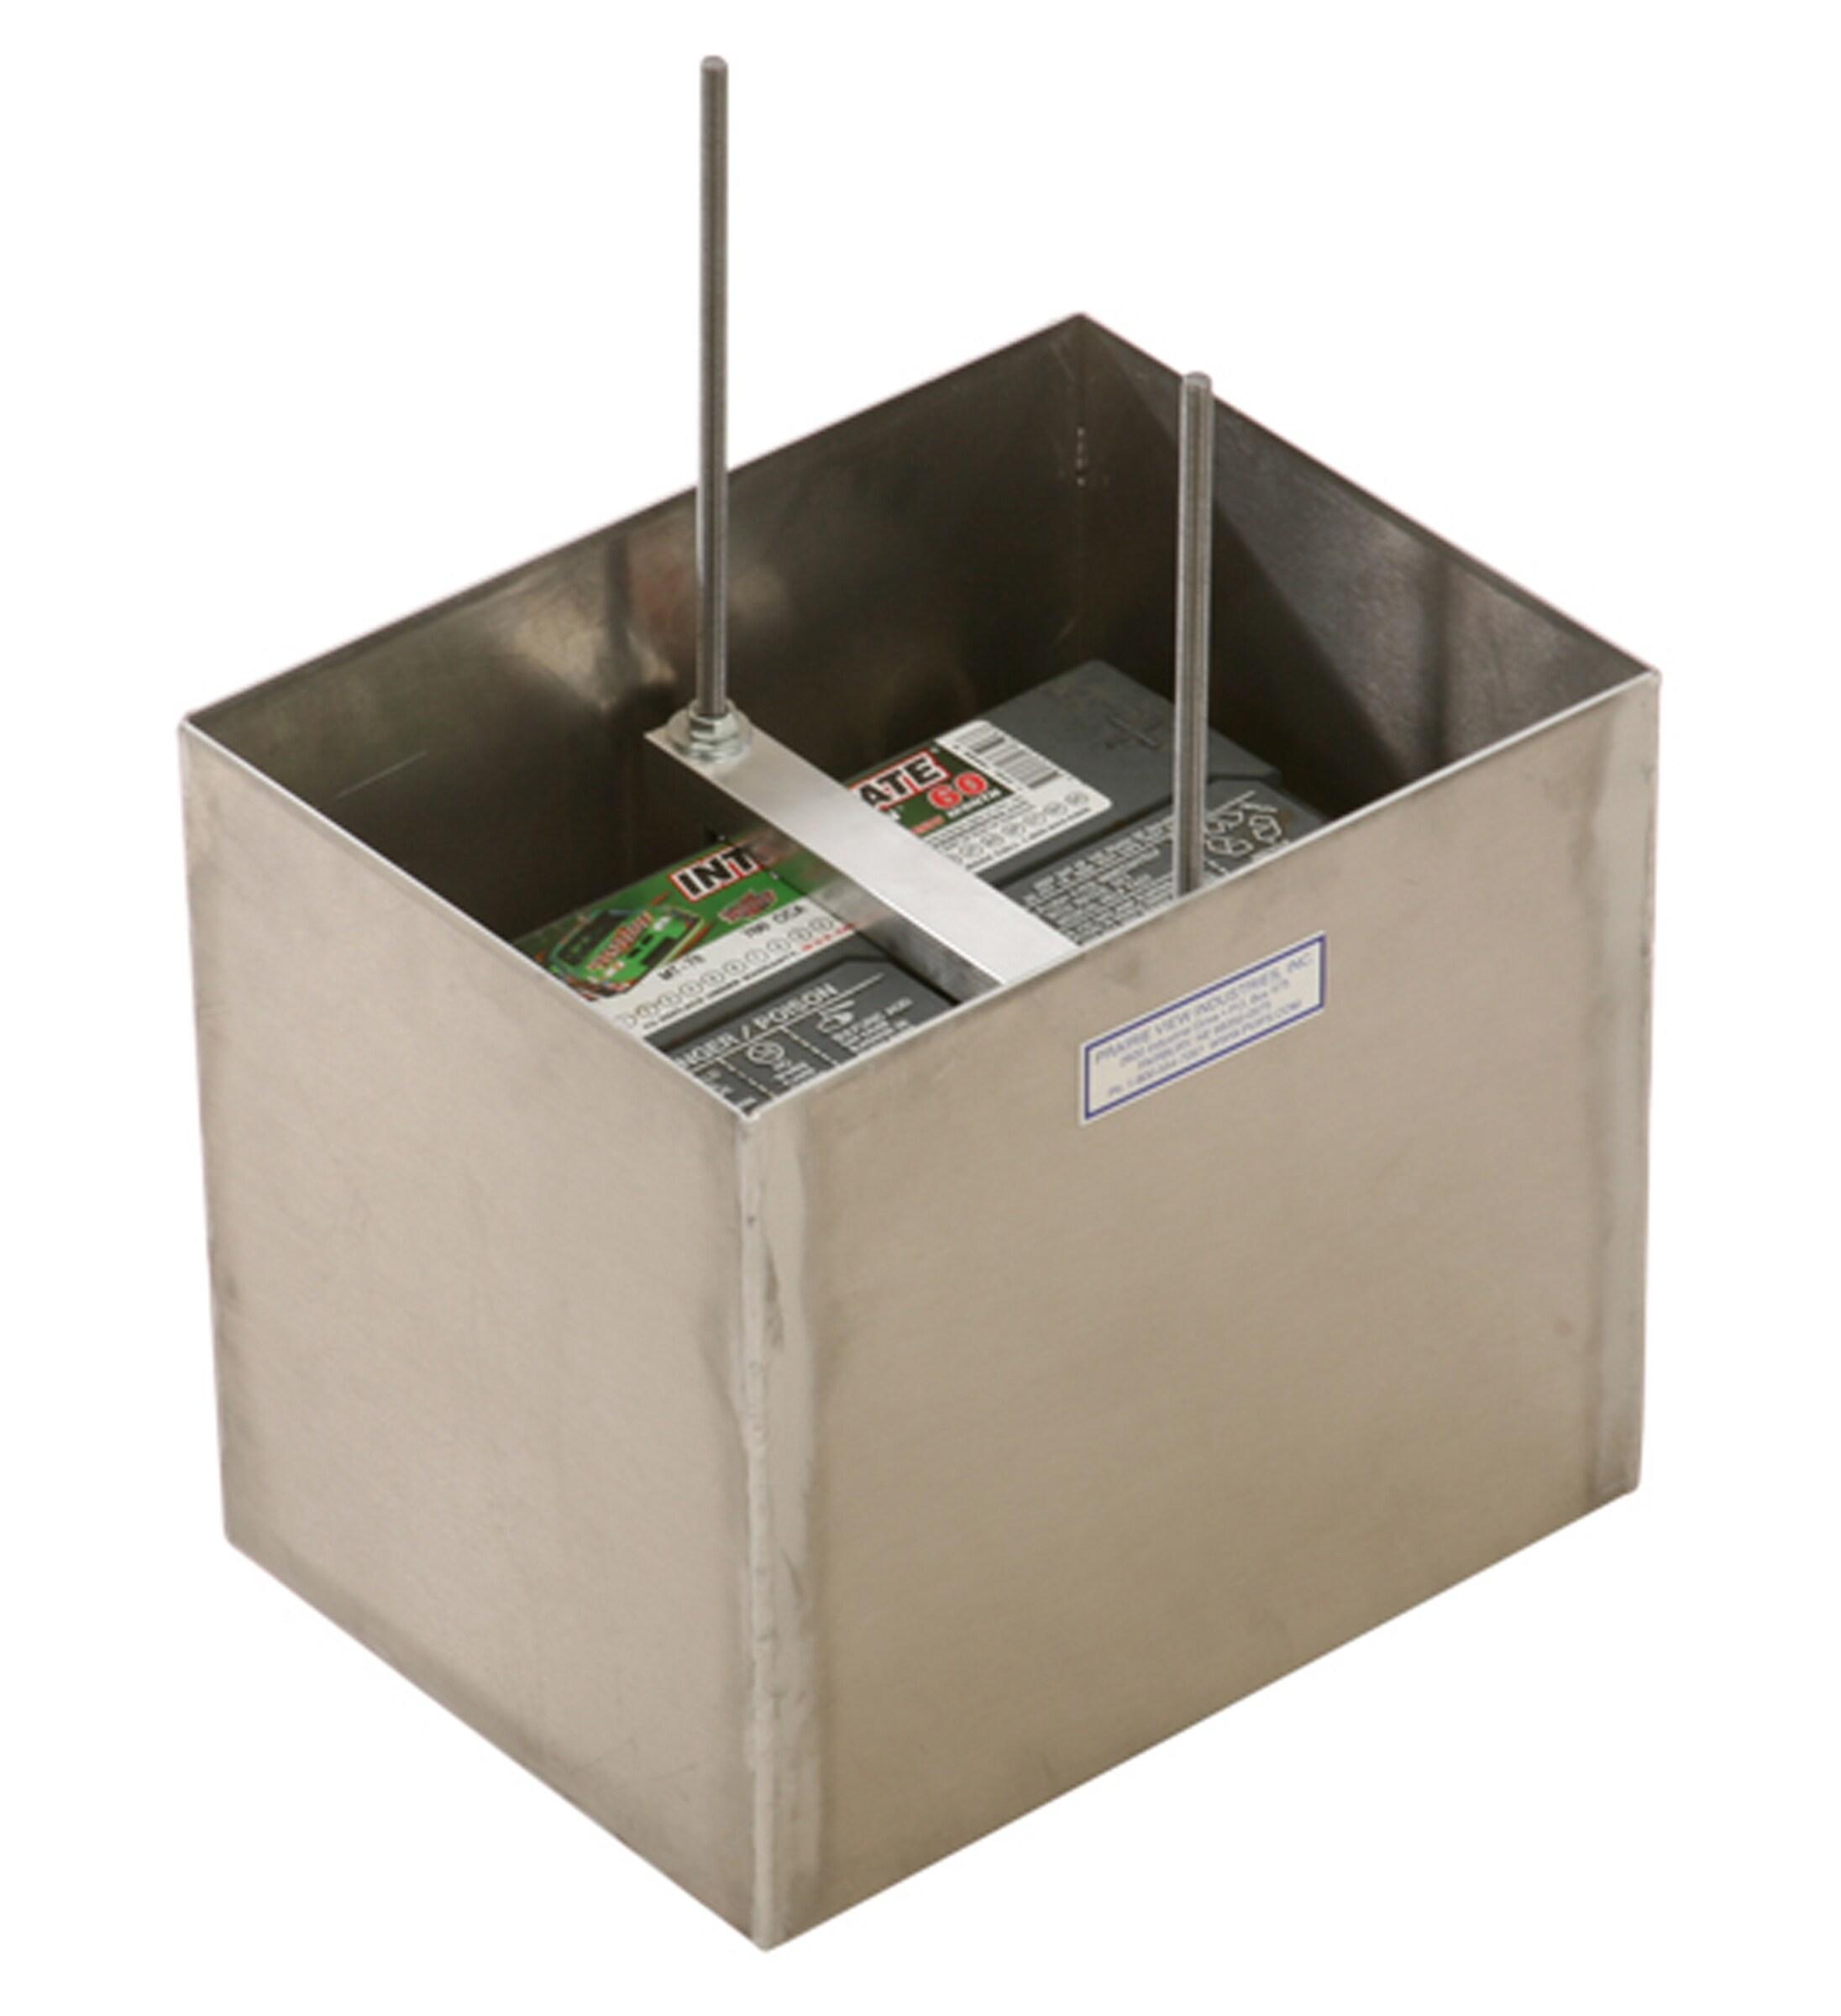 Single Battery Box - Thumbnail 1